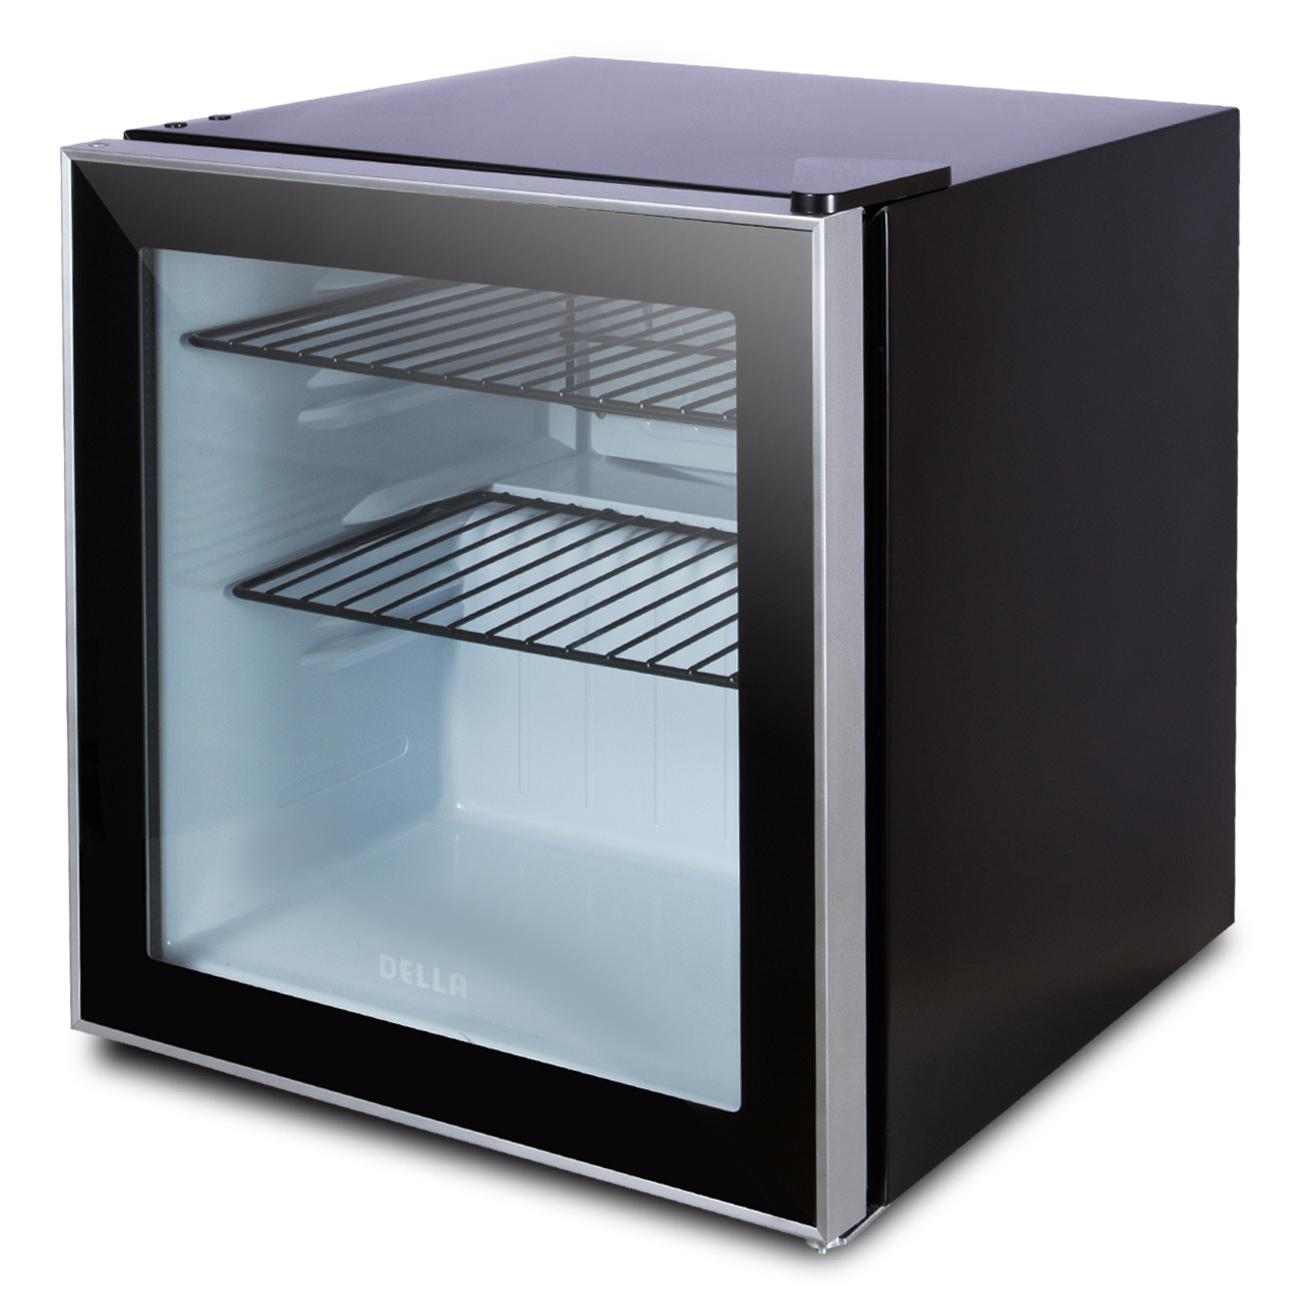 New Mini Beverage Fridge Built In Cooler Refrigerator